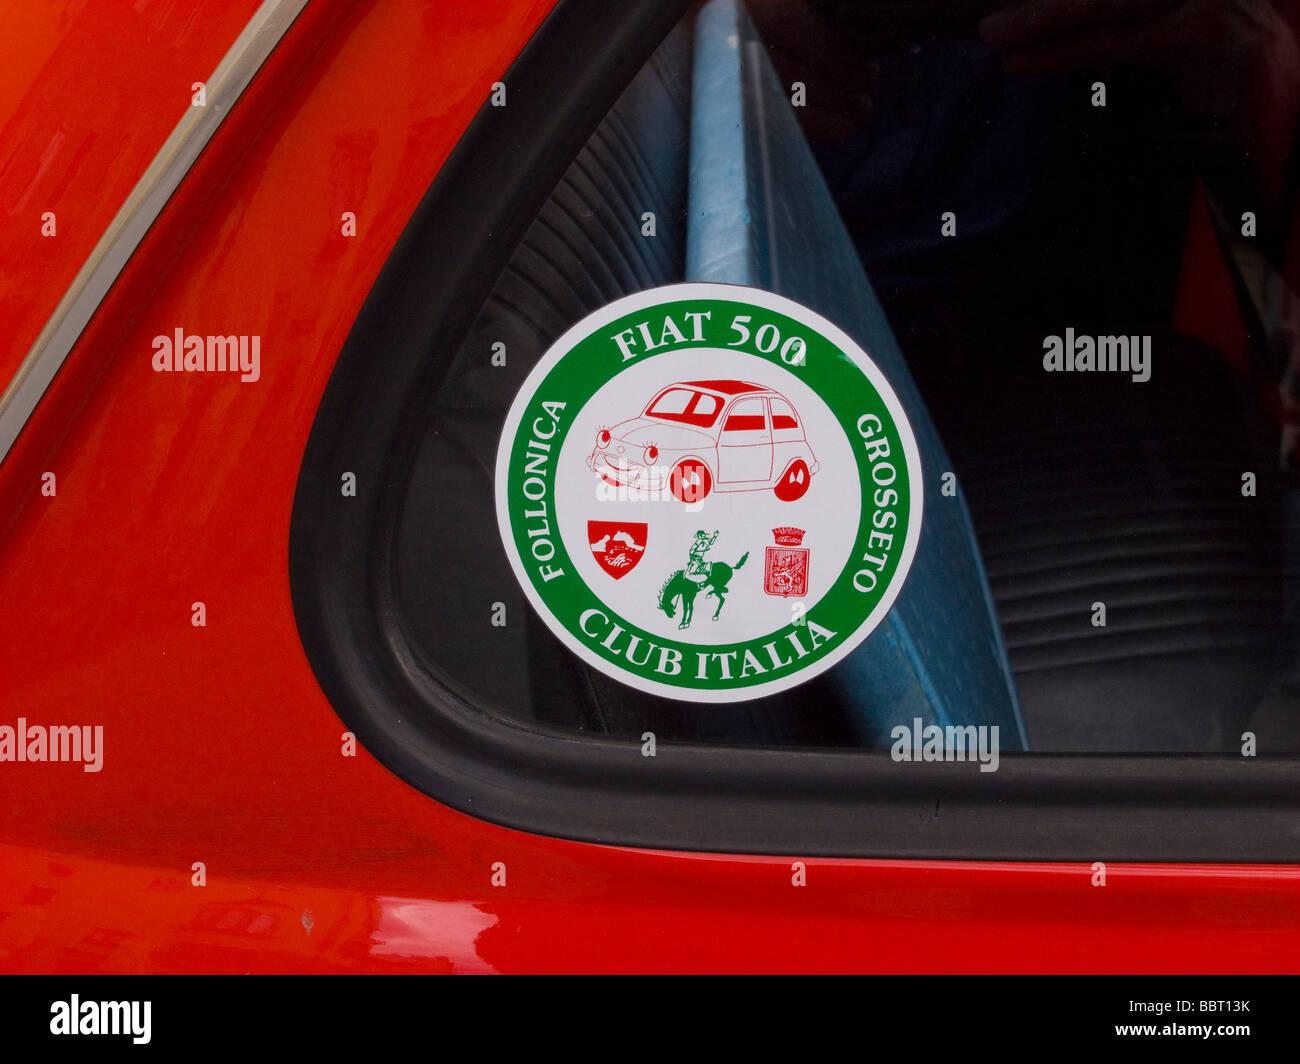 Fiat 500 Club Italia Sticker On A Red Vintage Fiat 500 At